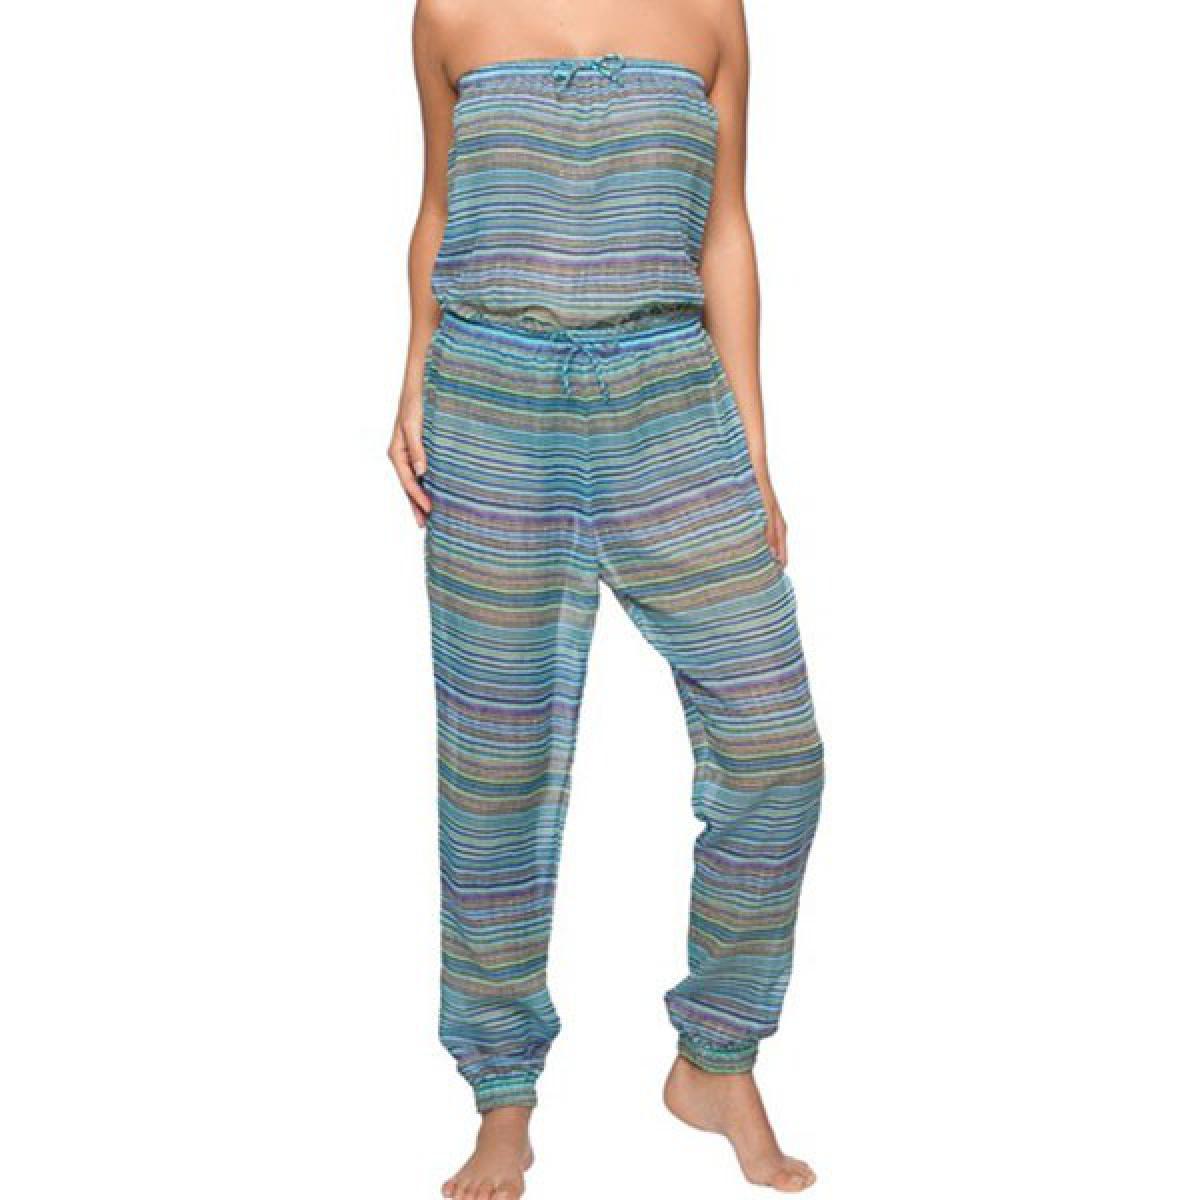 sortie PRIMADONNA SWIM Combinaison pantalon Prima Donna RUMBA aruba blue délogeant Finishline Vente Pas Cher Vente Pas Cher Geniue Stockiste idTkZcdMW